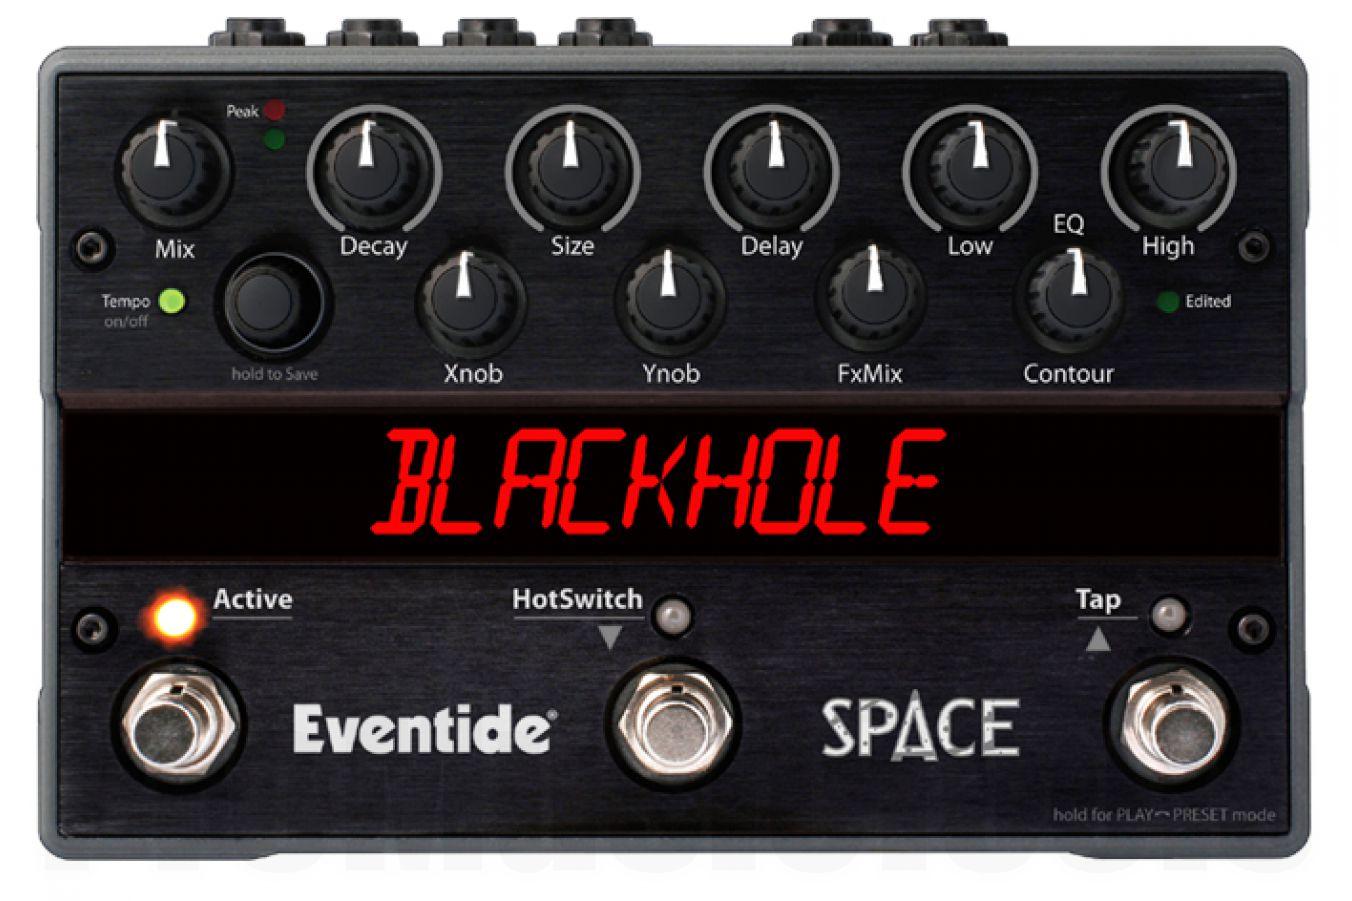 Eventide Space Reverb - demo